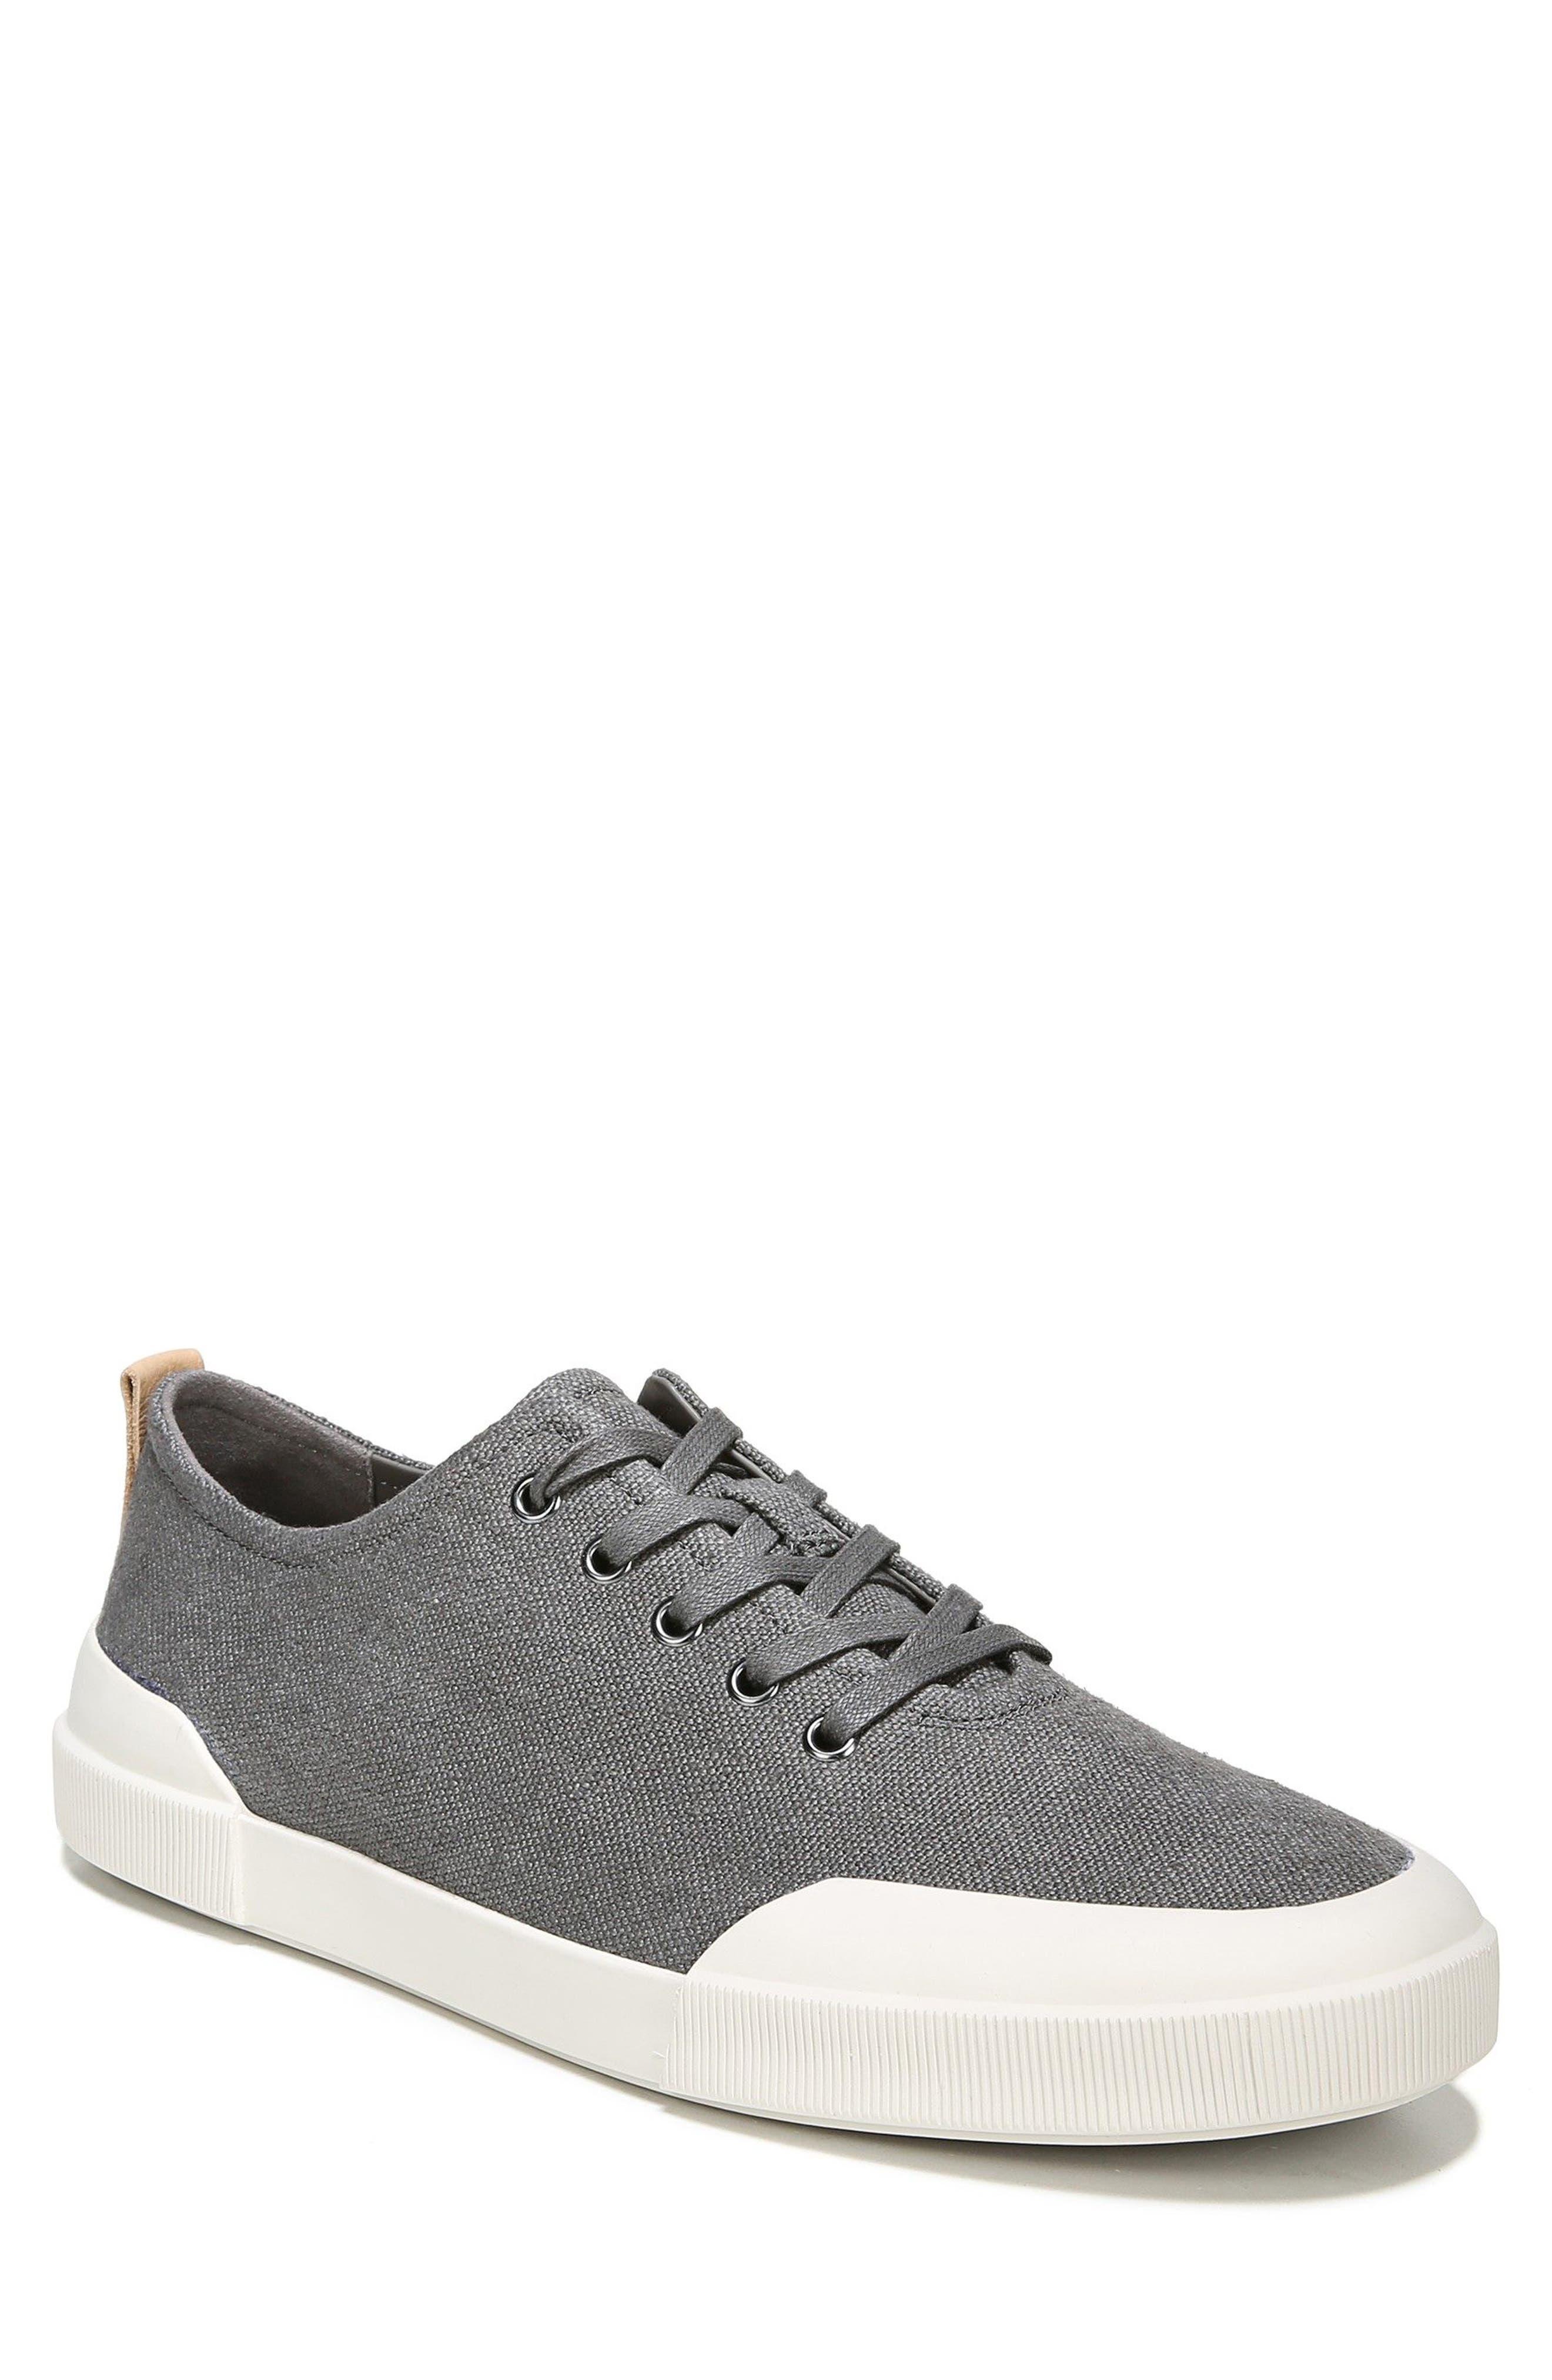 Victor Low Top Sneaker,                         Main,                         color, 020